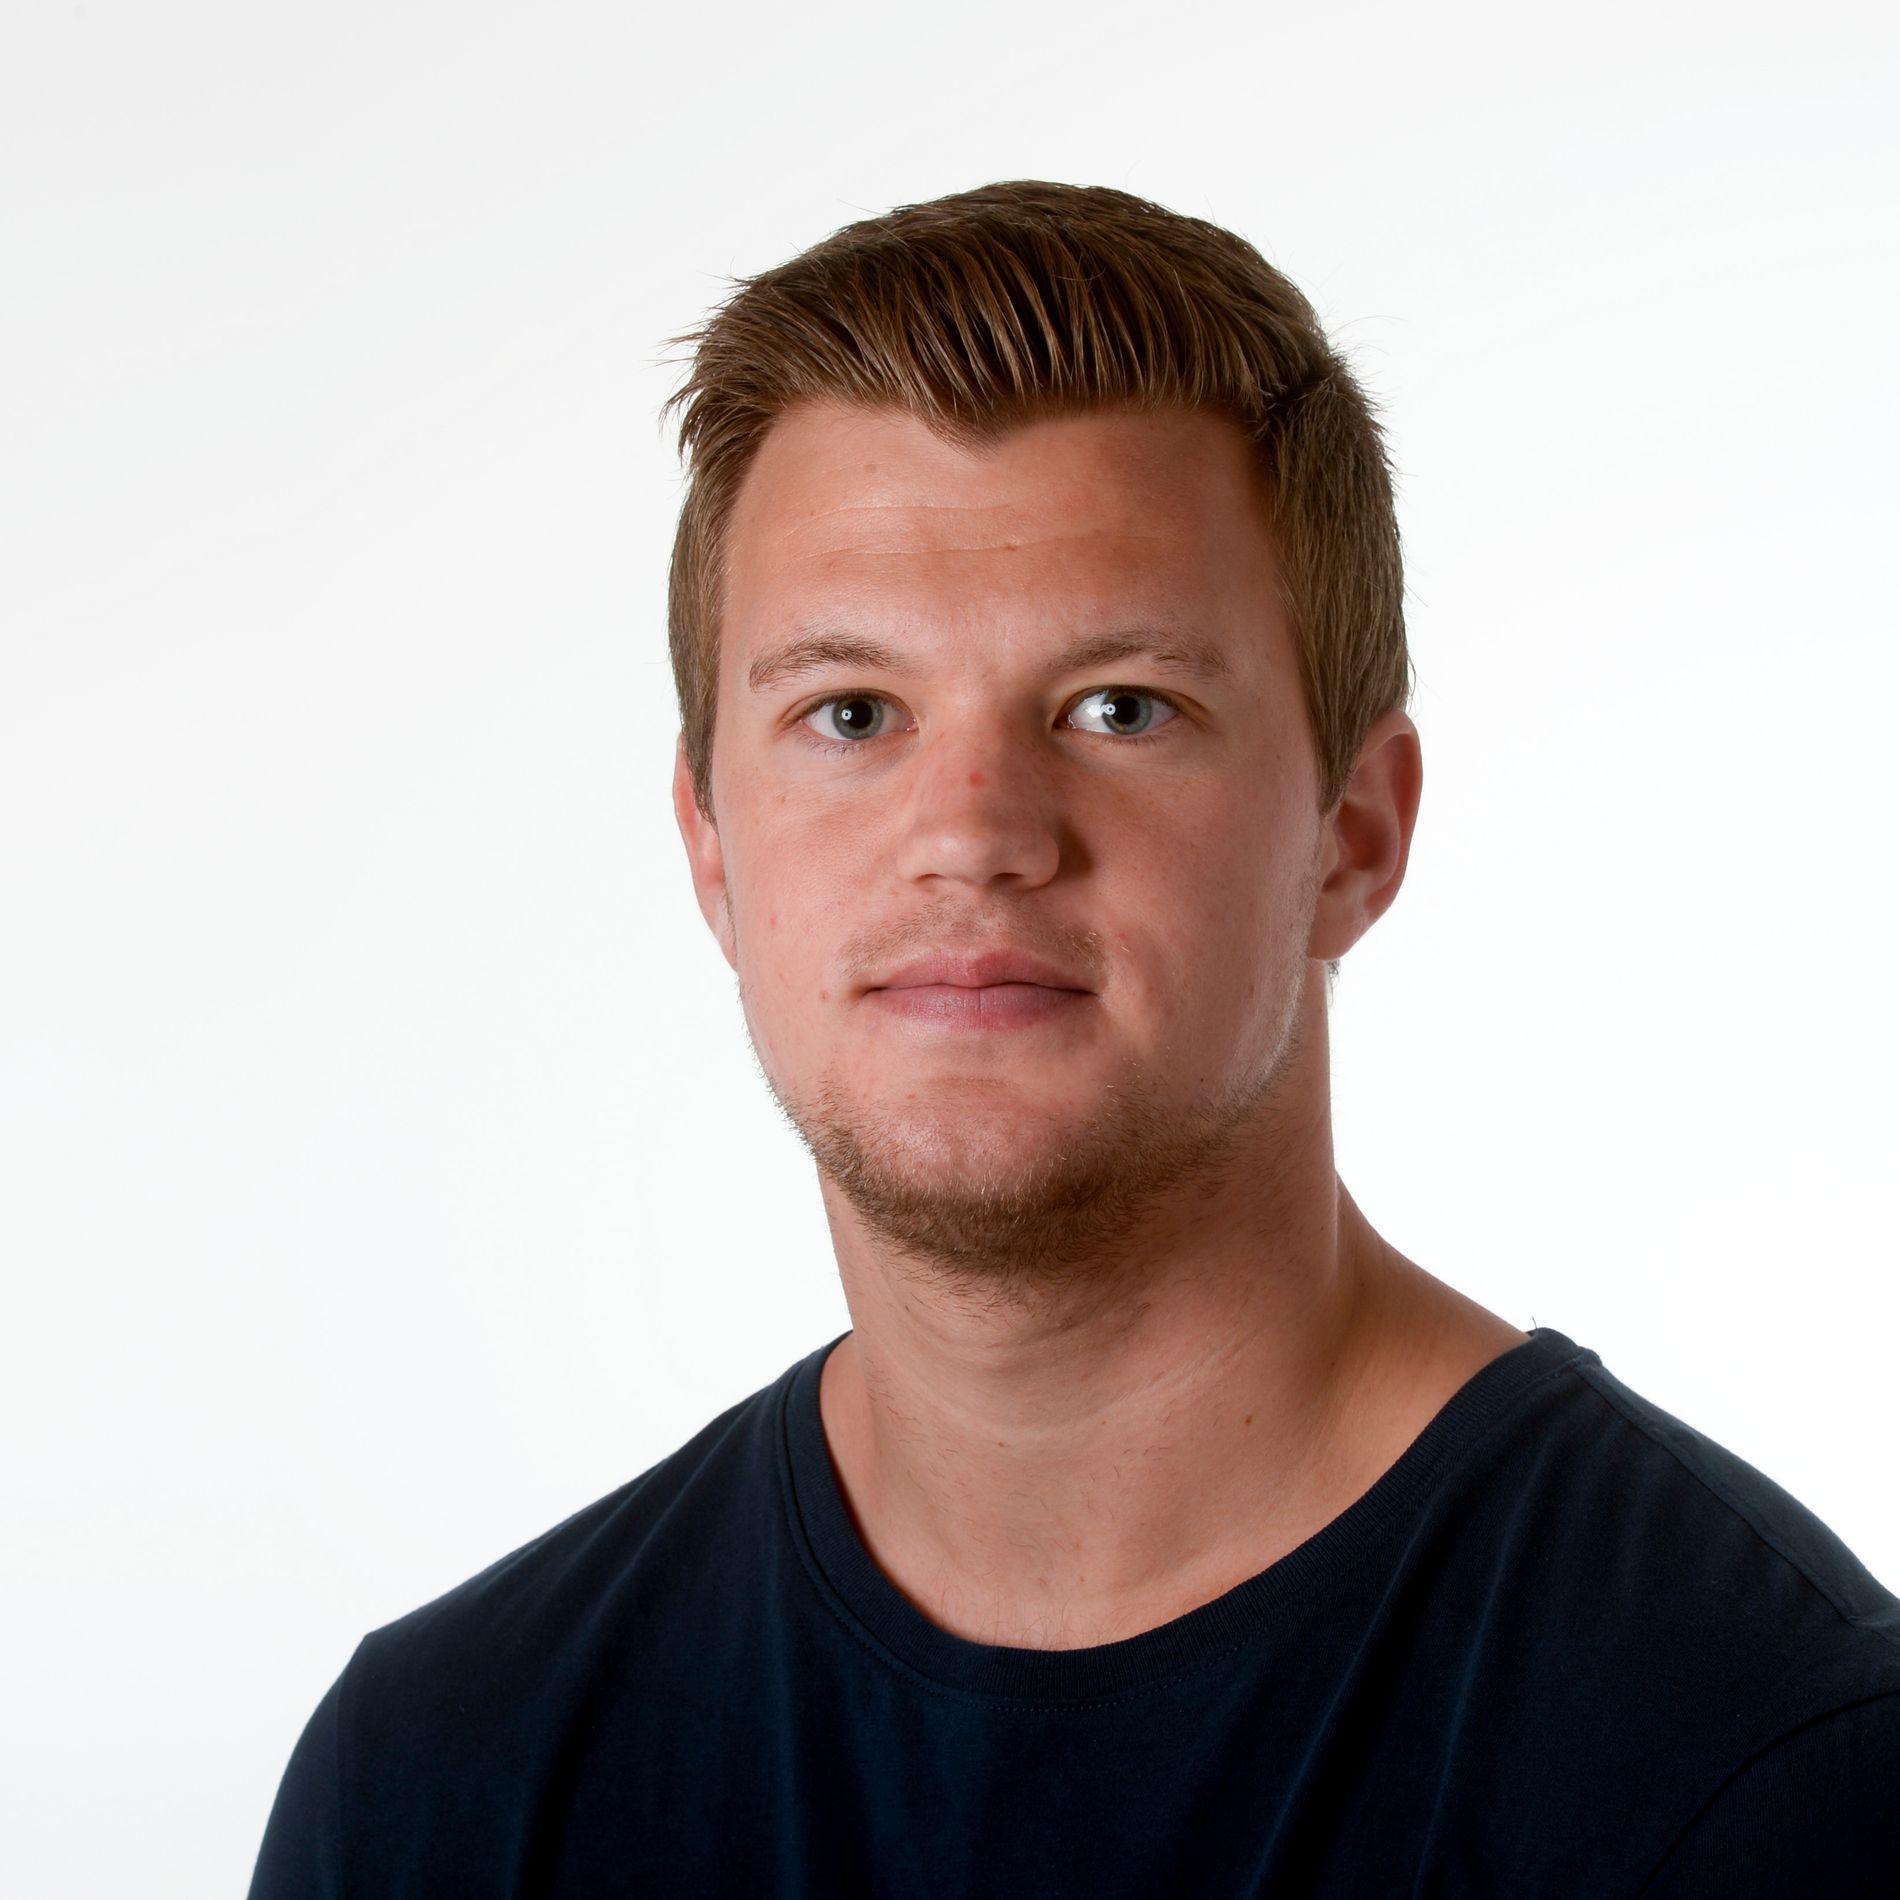 Mats Haugland